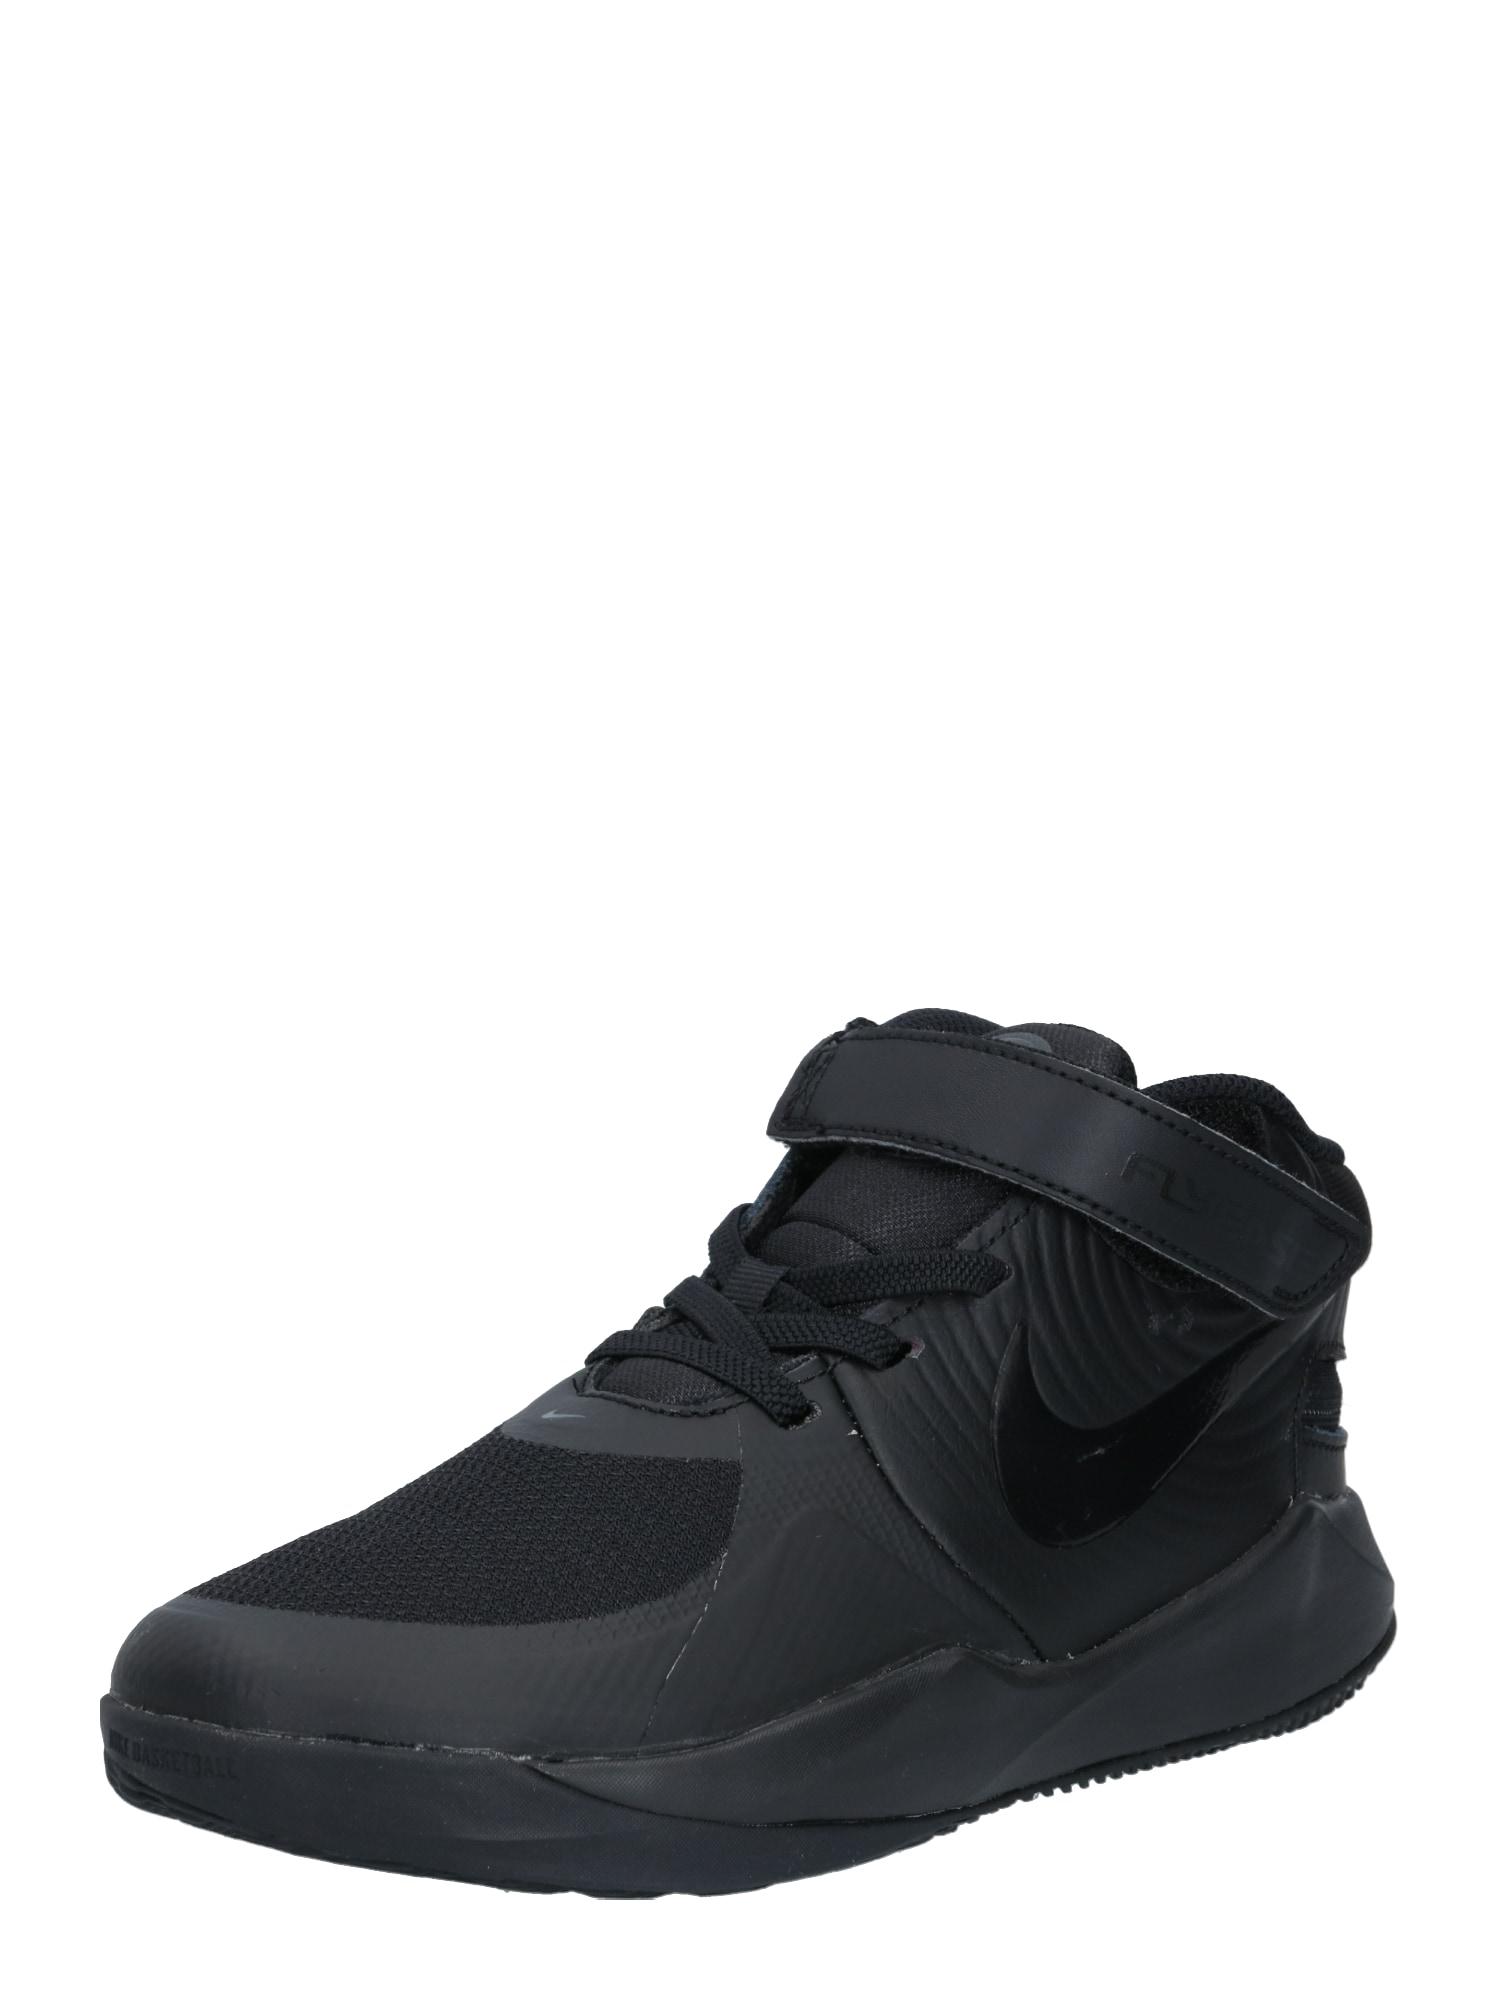 NIKE Sportiniai batai 'Hustle D 9 FlyEase' juoda